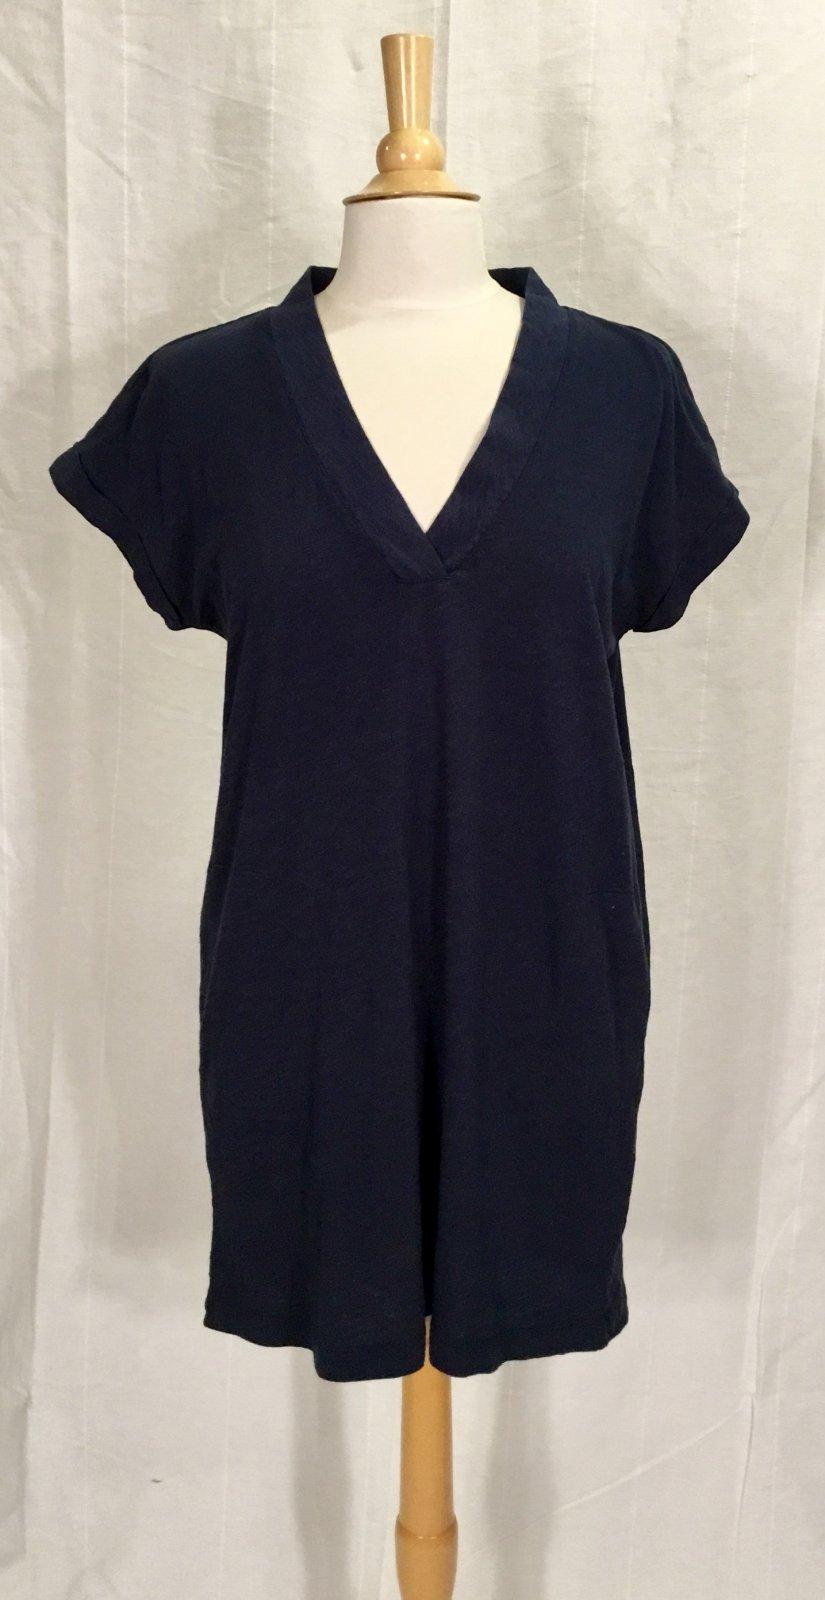 Bobi S/S Dolman V-Neck Dress